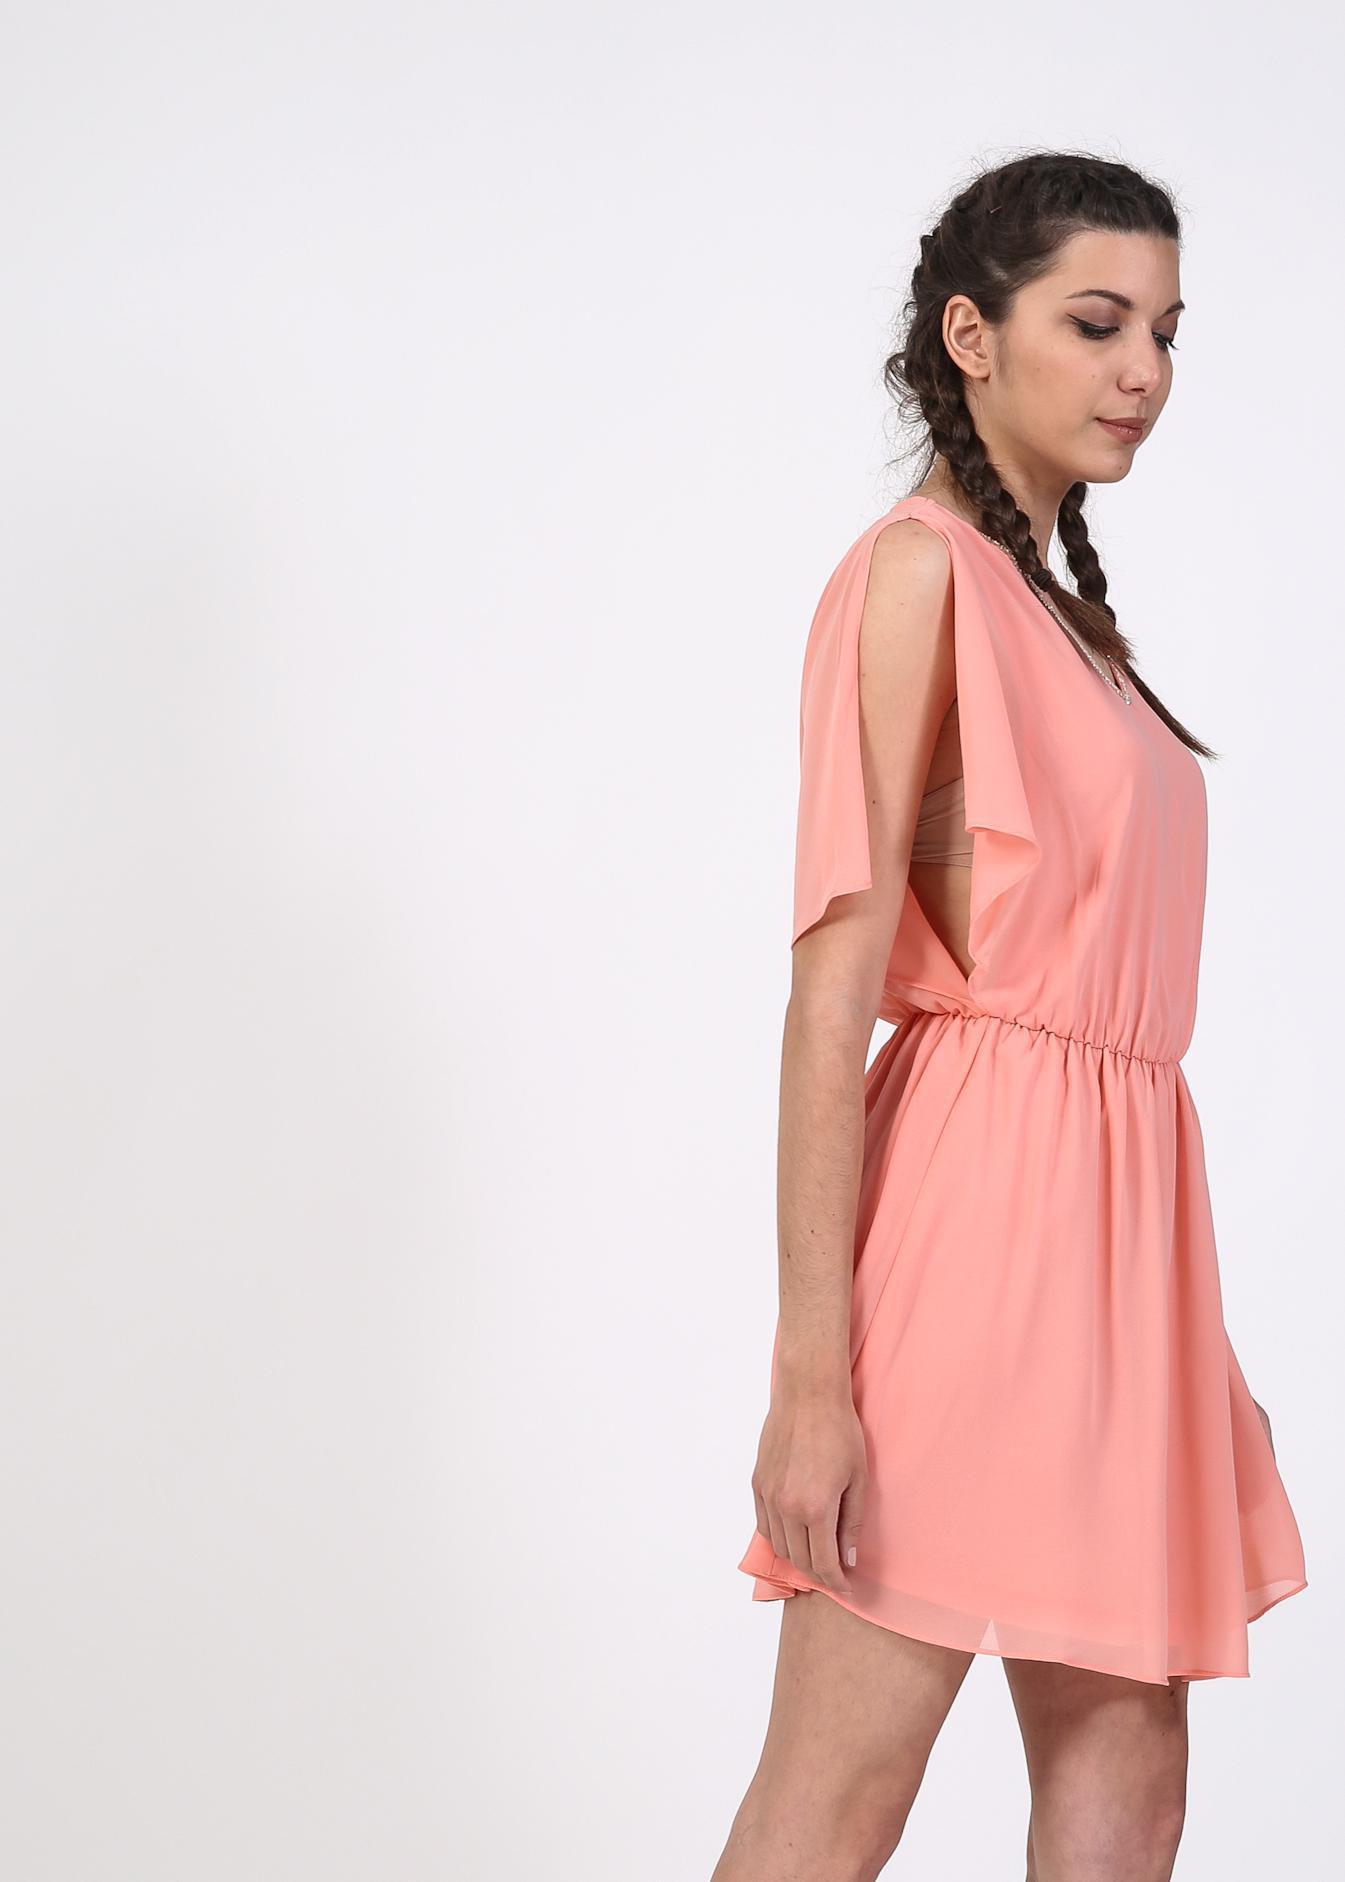 Inez v neck φόρεμα  ροζ